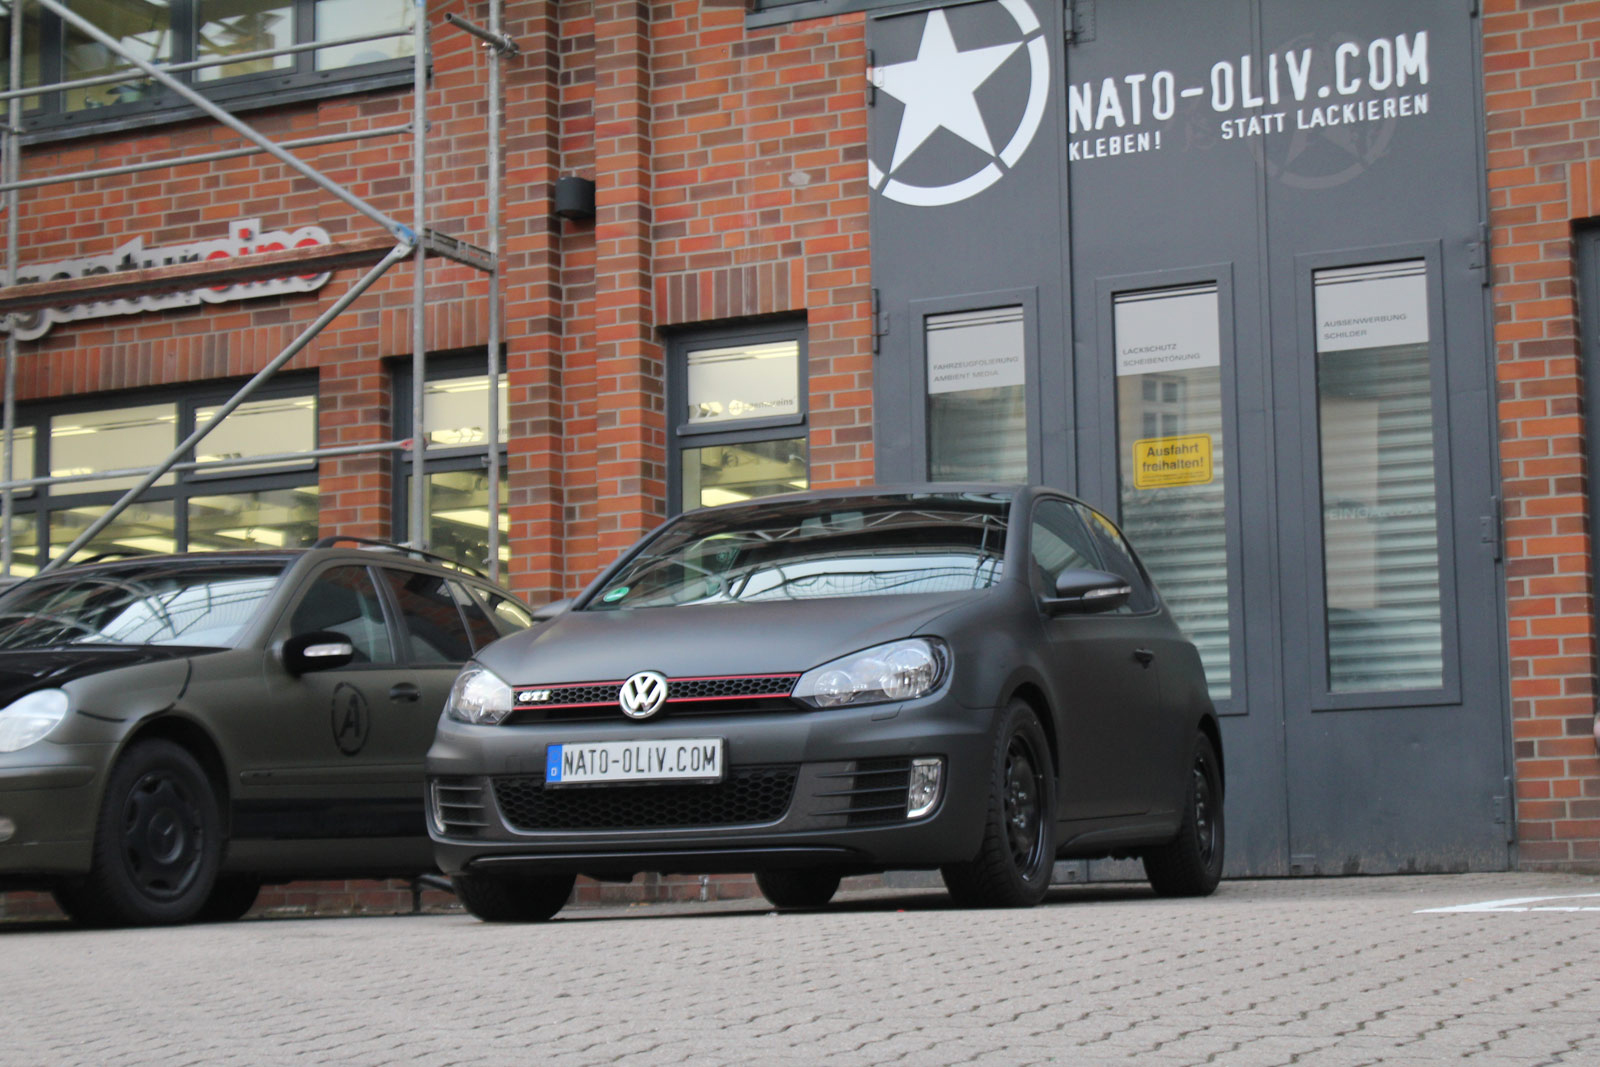 VW_GOLF_GTI_SCHWARZ_MATT_SCHEIBENTOENUNG_08